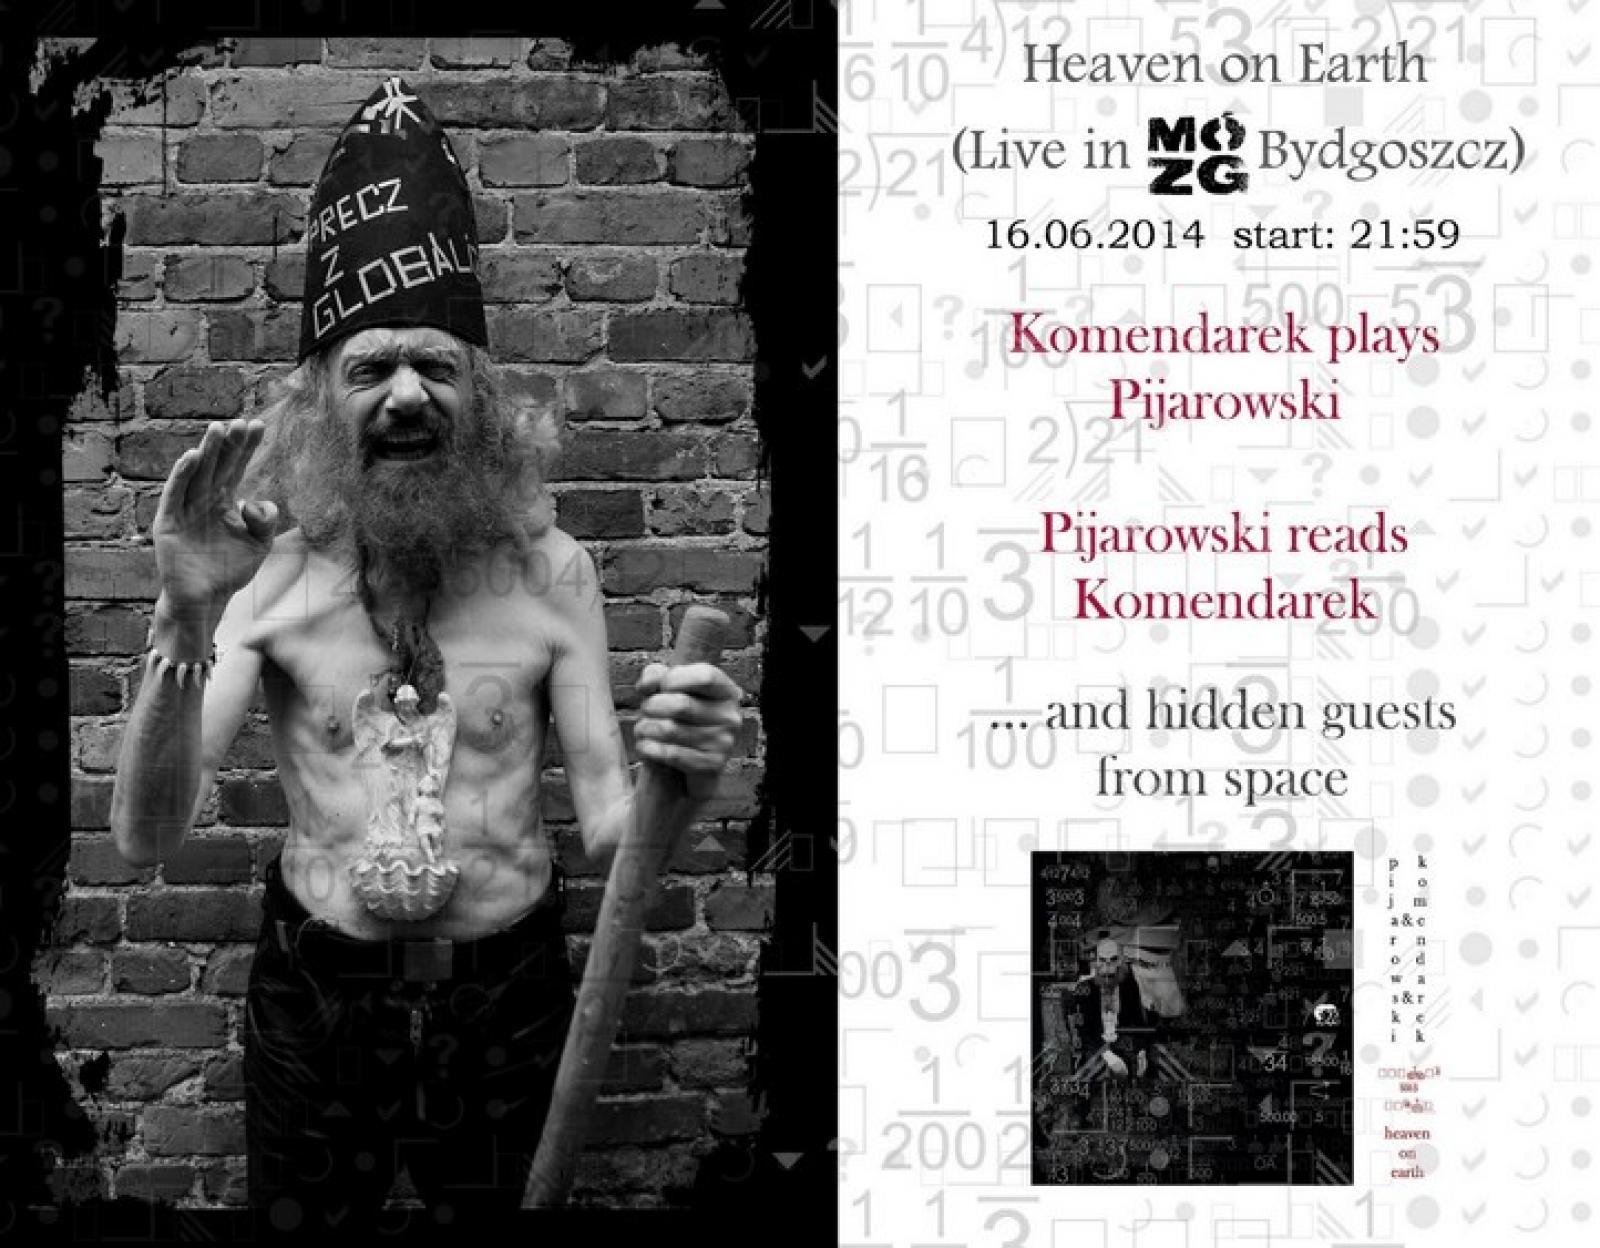 KOMENDAREK PLAYS PIJAROWSKI PIJAROWSKI READS KOMENDAREK – koncert/sesja nagraniowa